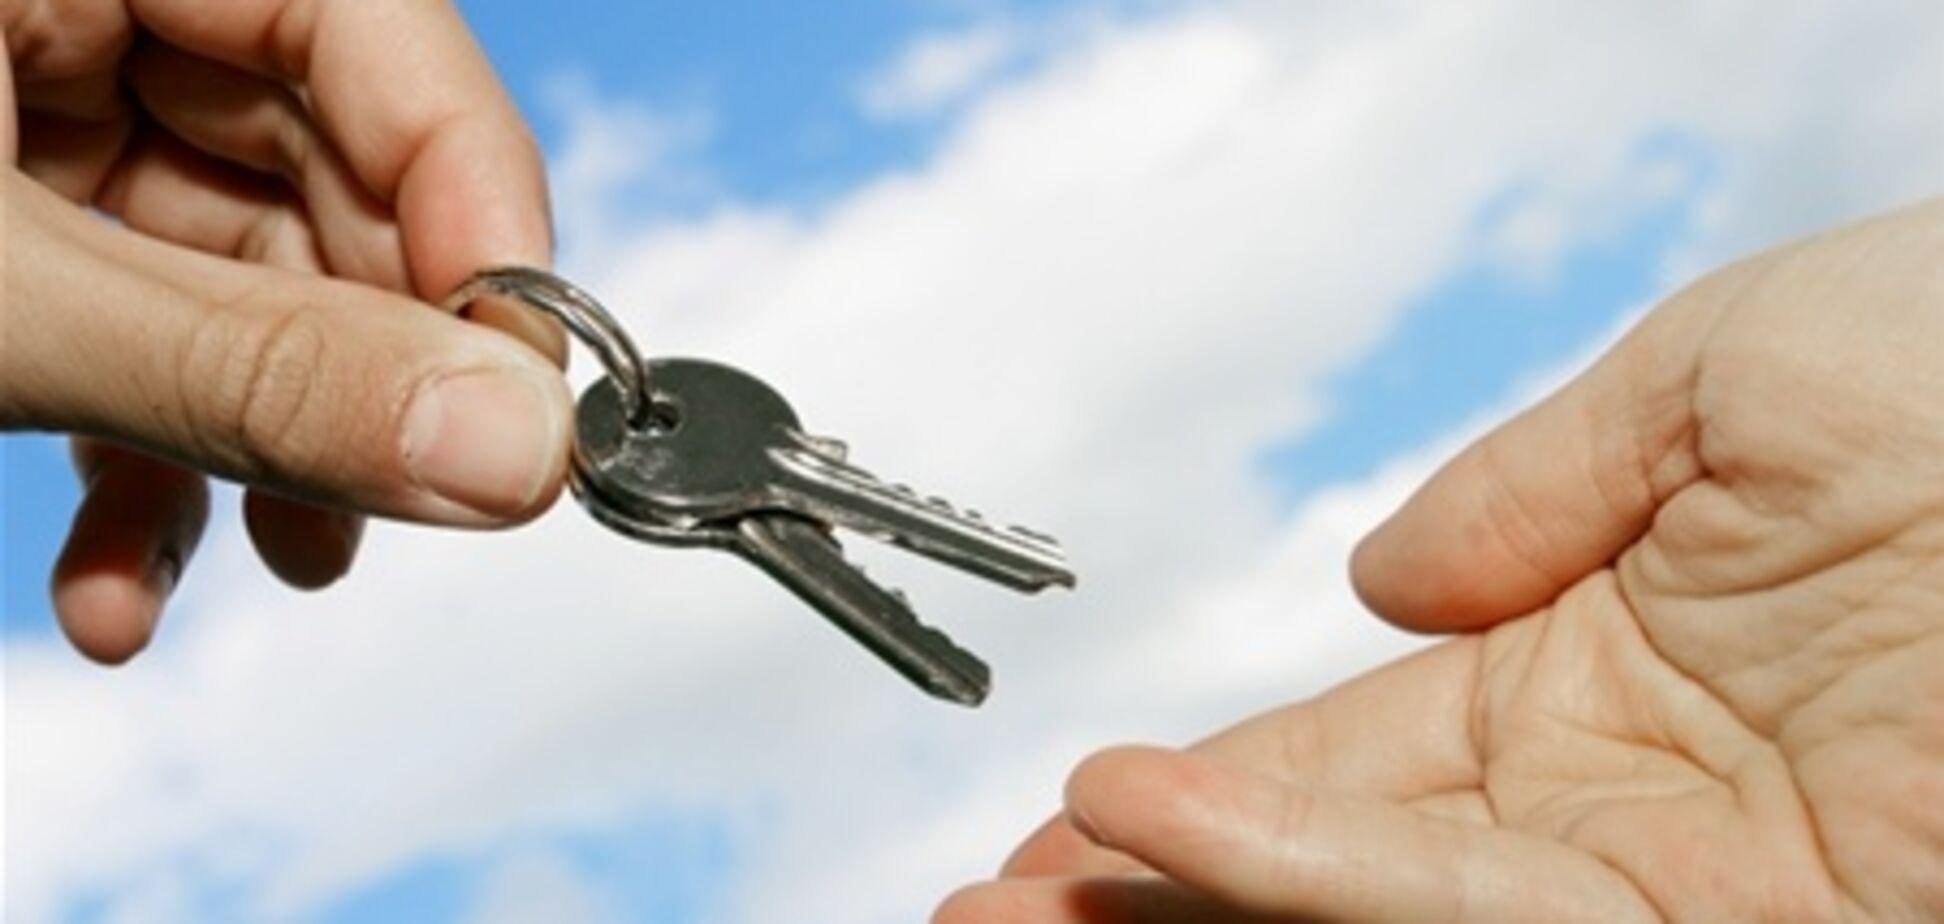 Итоги 2012 года на рынке купли-продажи квартир Киева